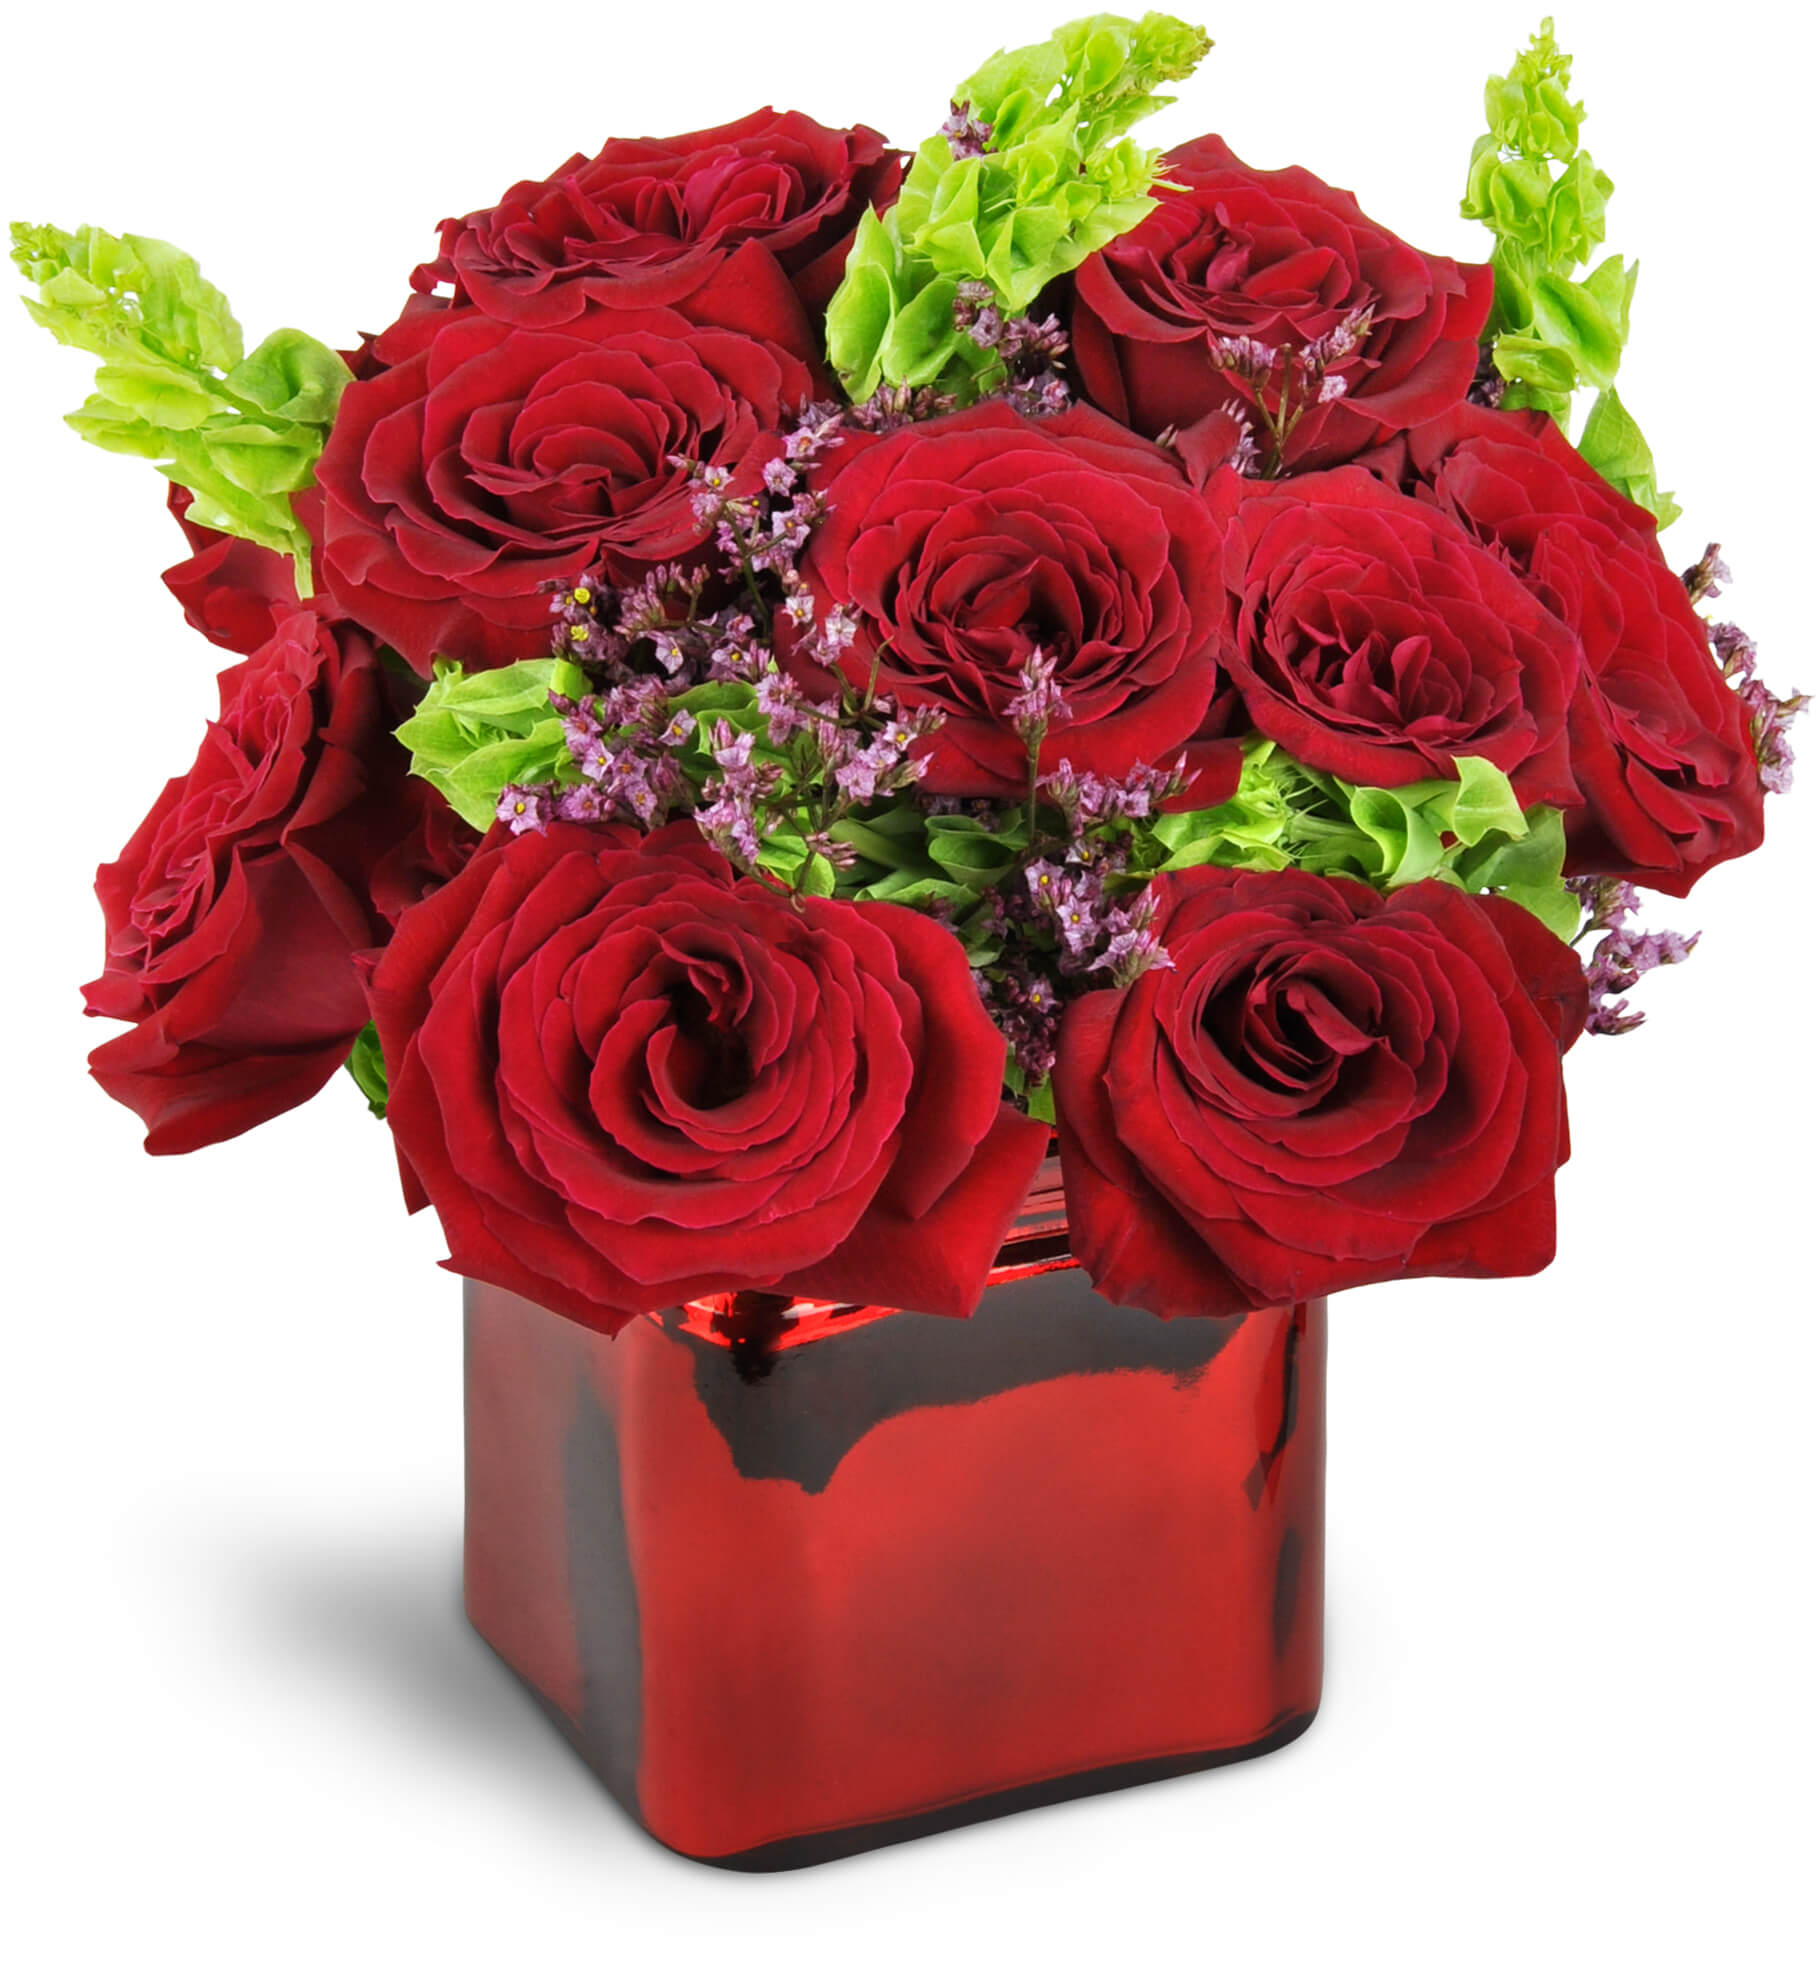 Two Dozen Red Roses Bronx Ny Florist